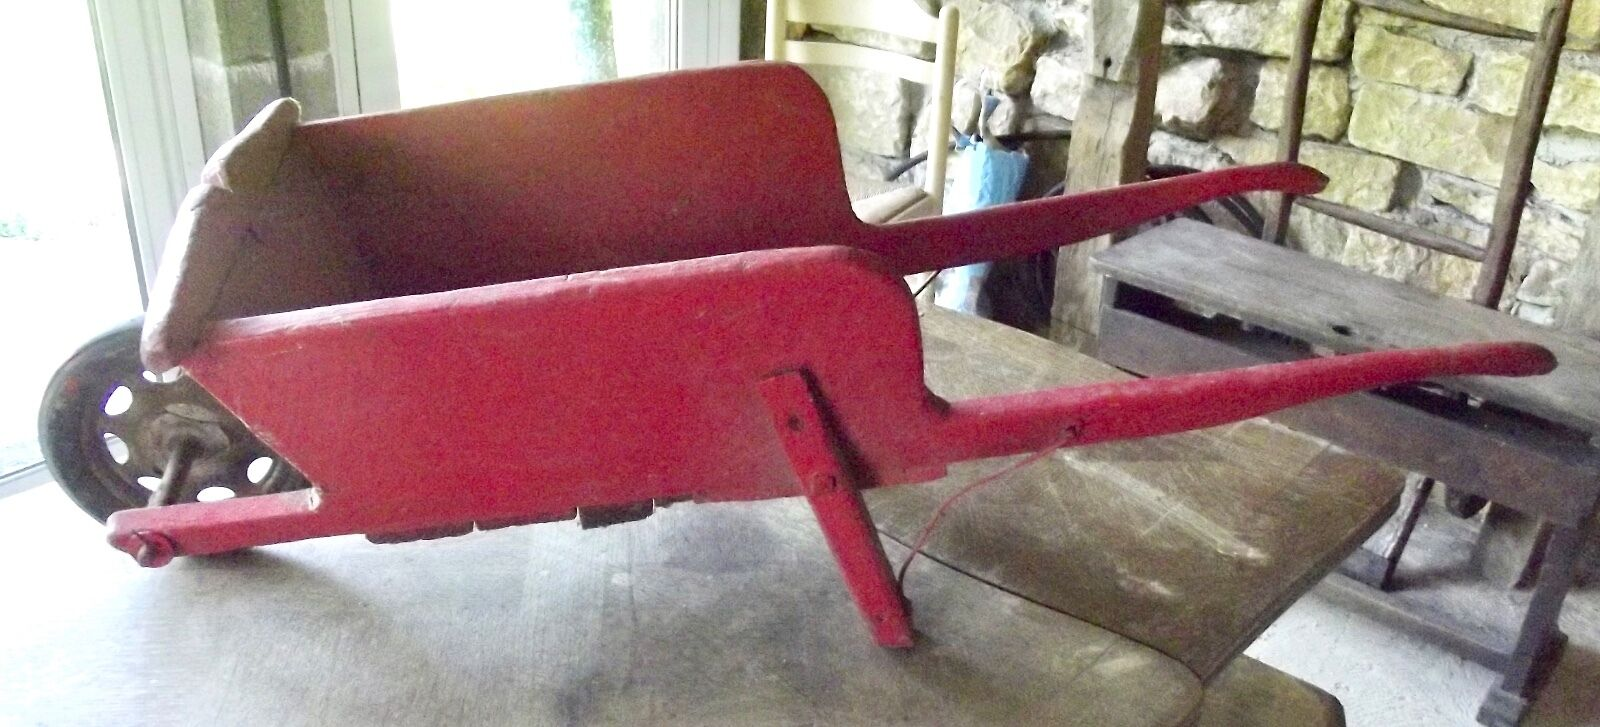 Antik Schubkarre Holz Rot Kind 1930 Vintage Reifen Michelin Voll Hof